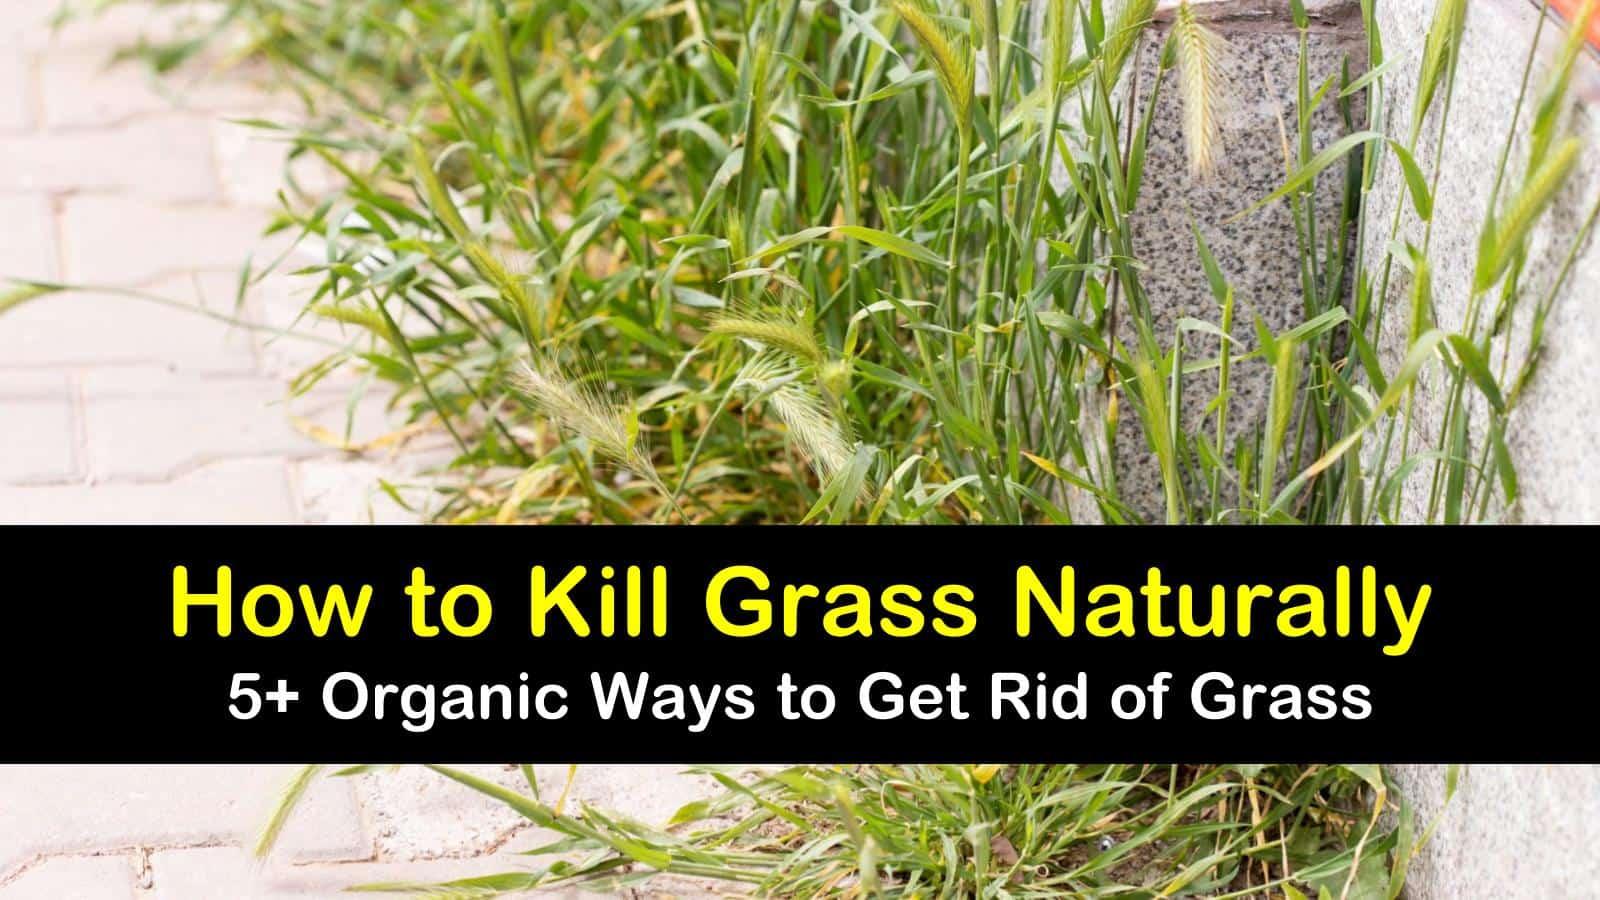 how to kill grass naturally titleimg1